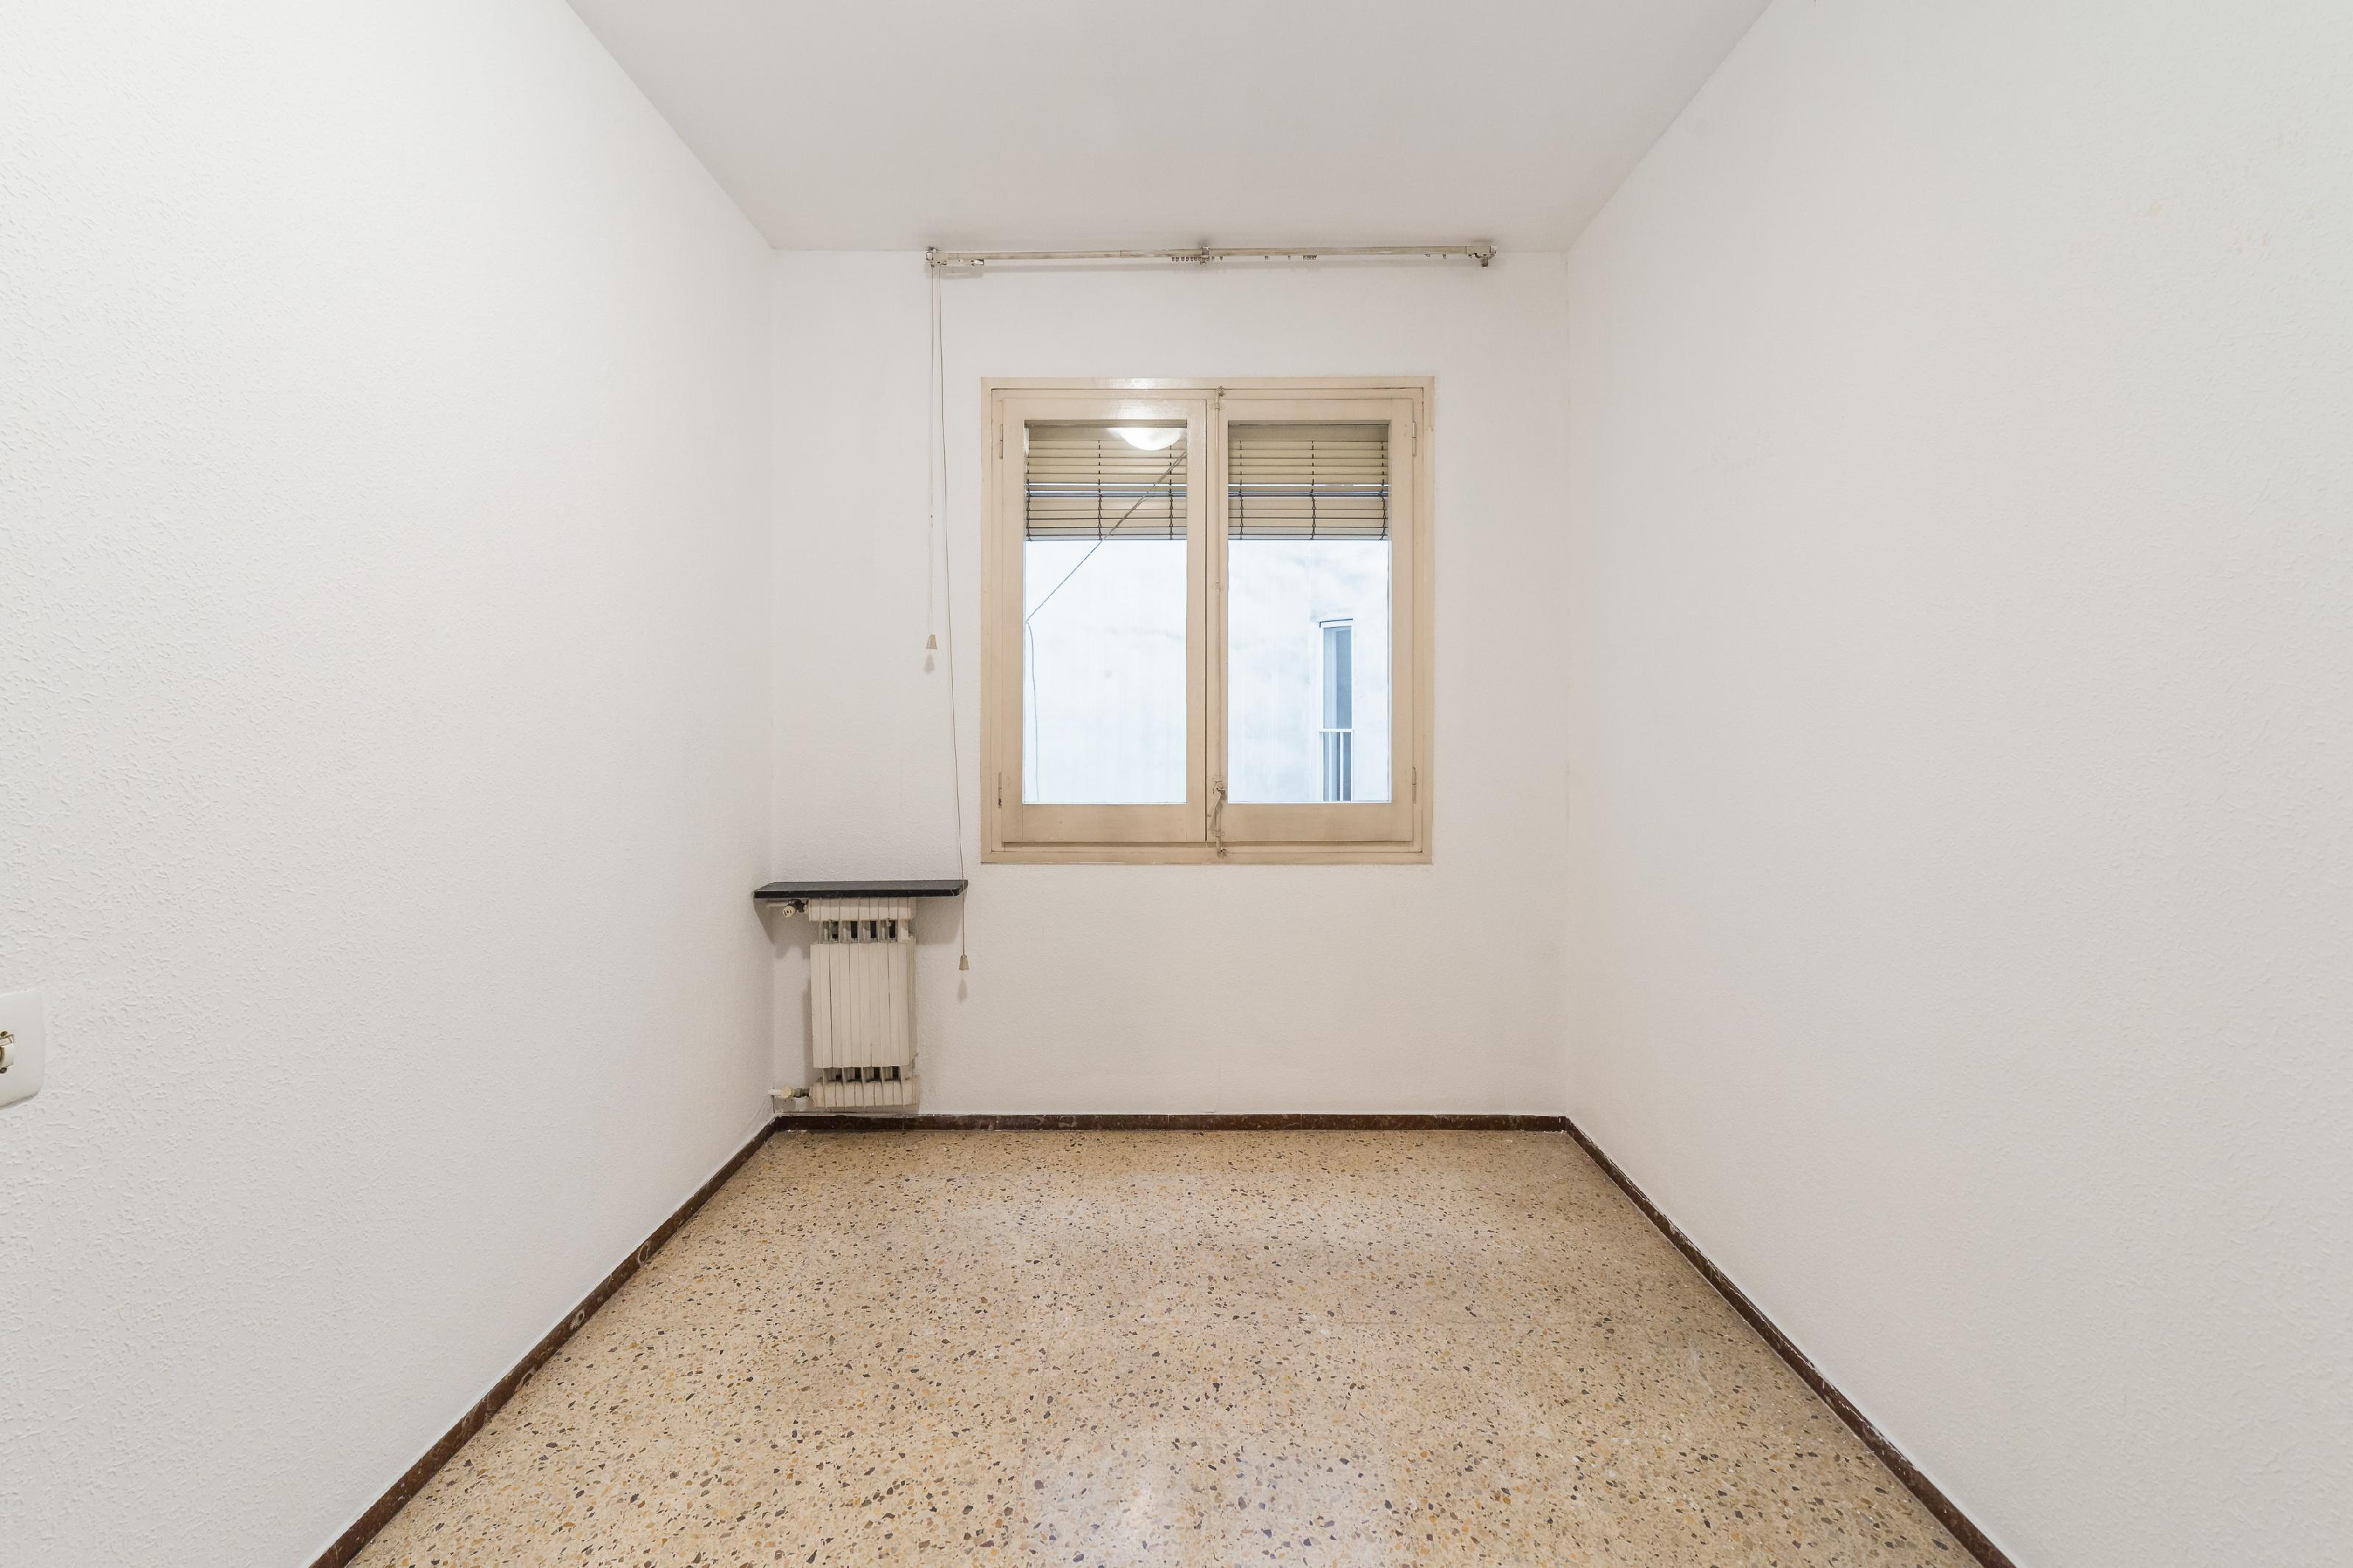 247624 Flat for sale in Eixample, Sant Antoni 21